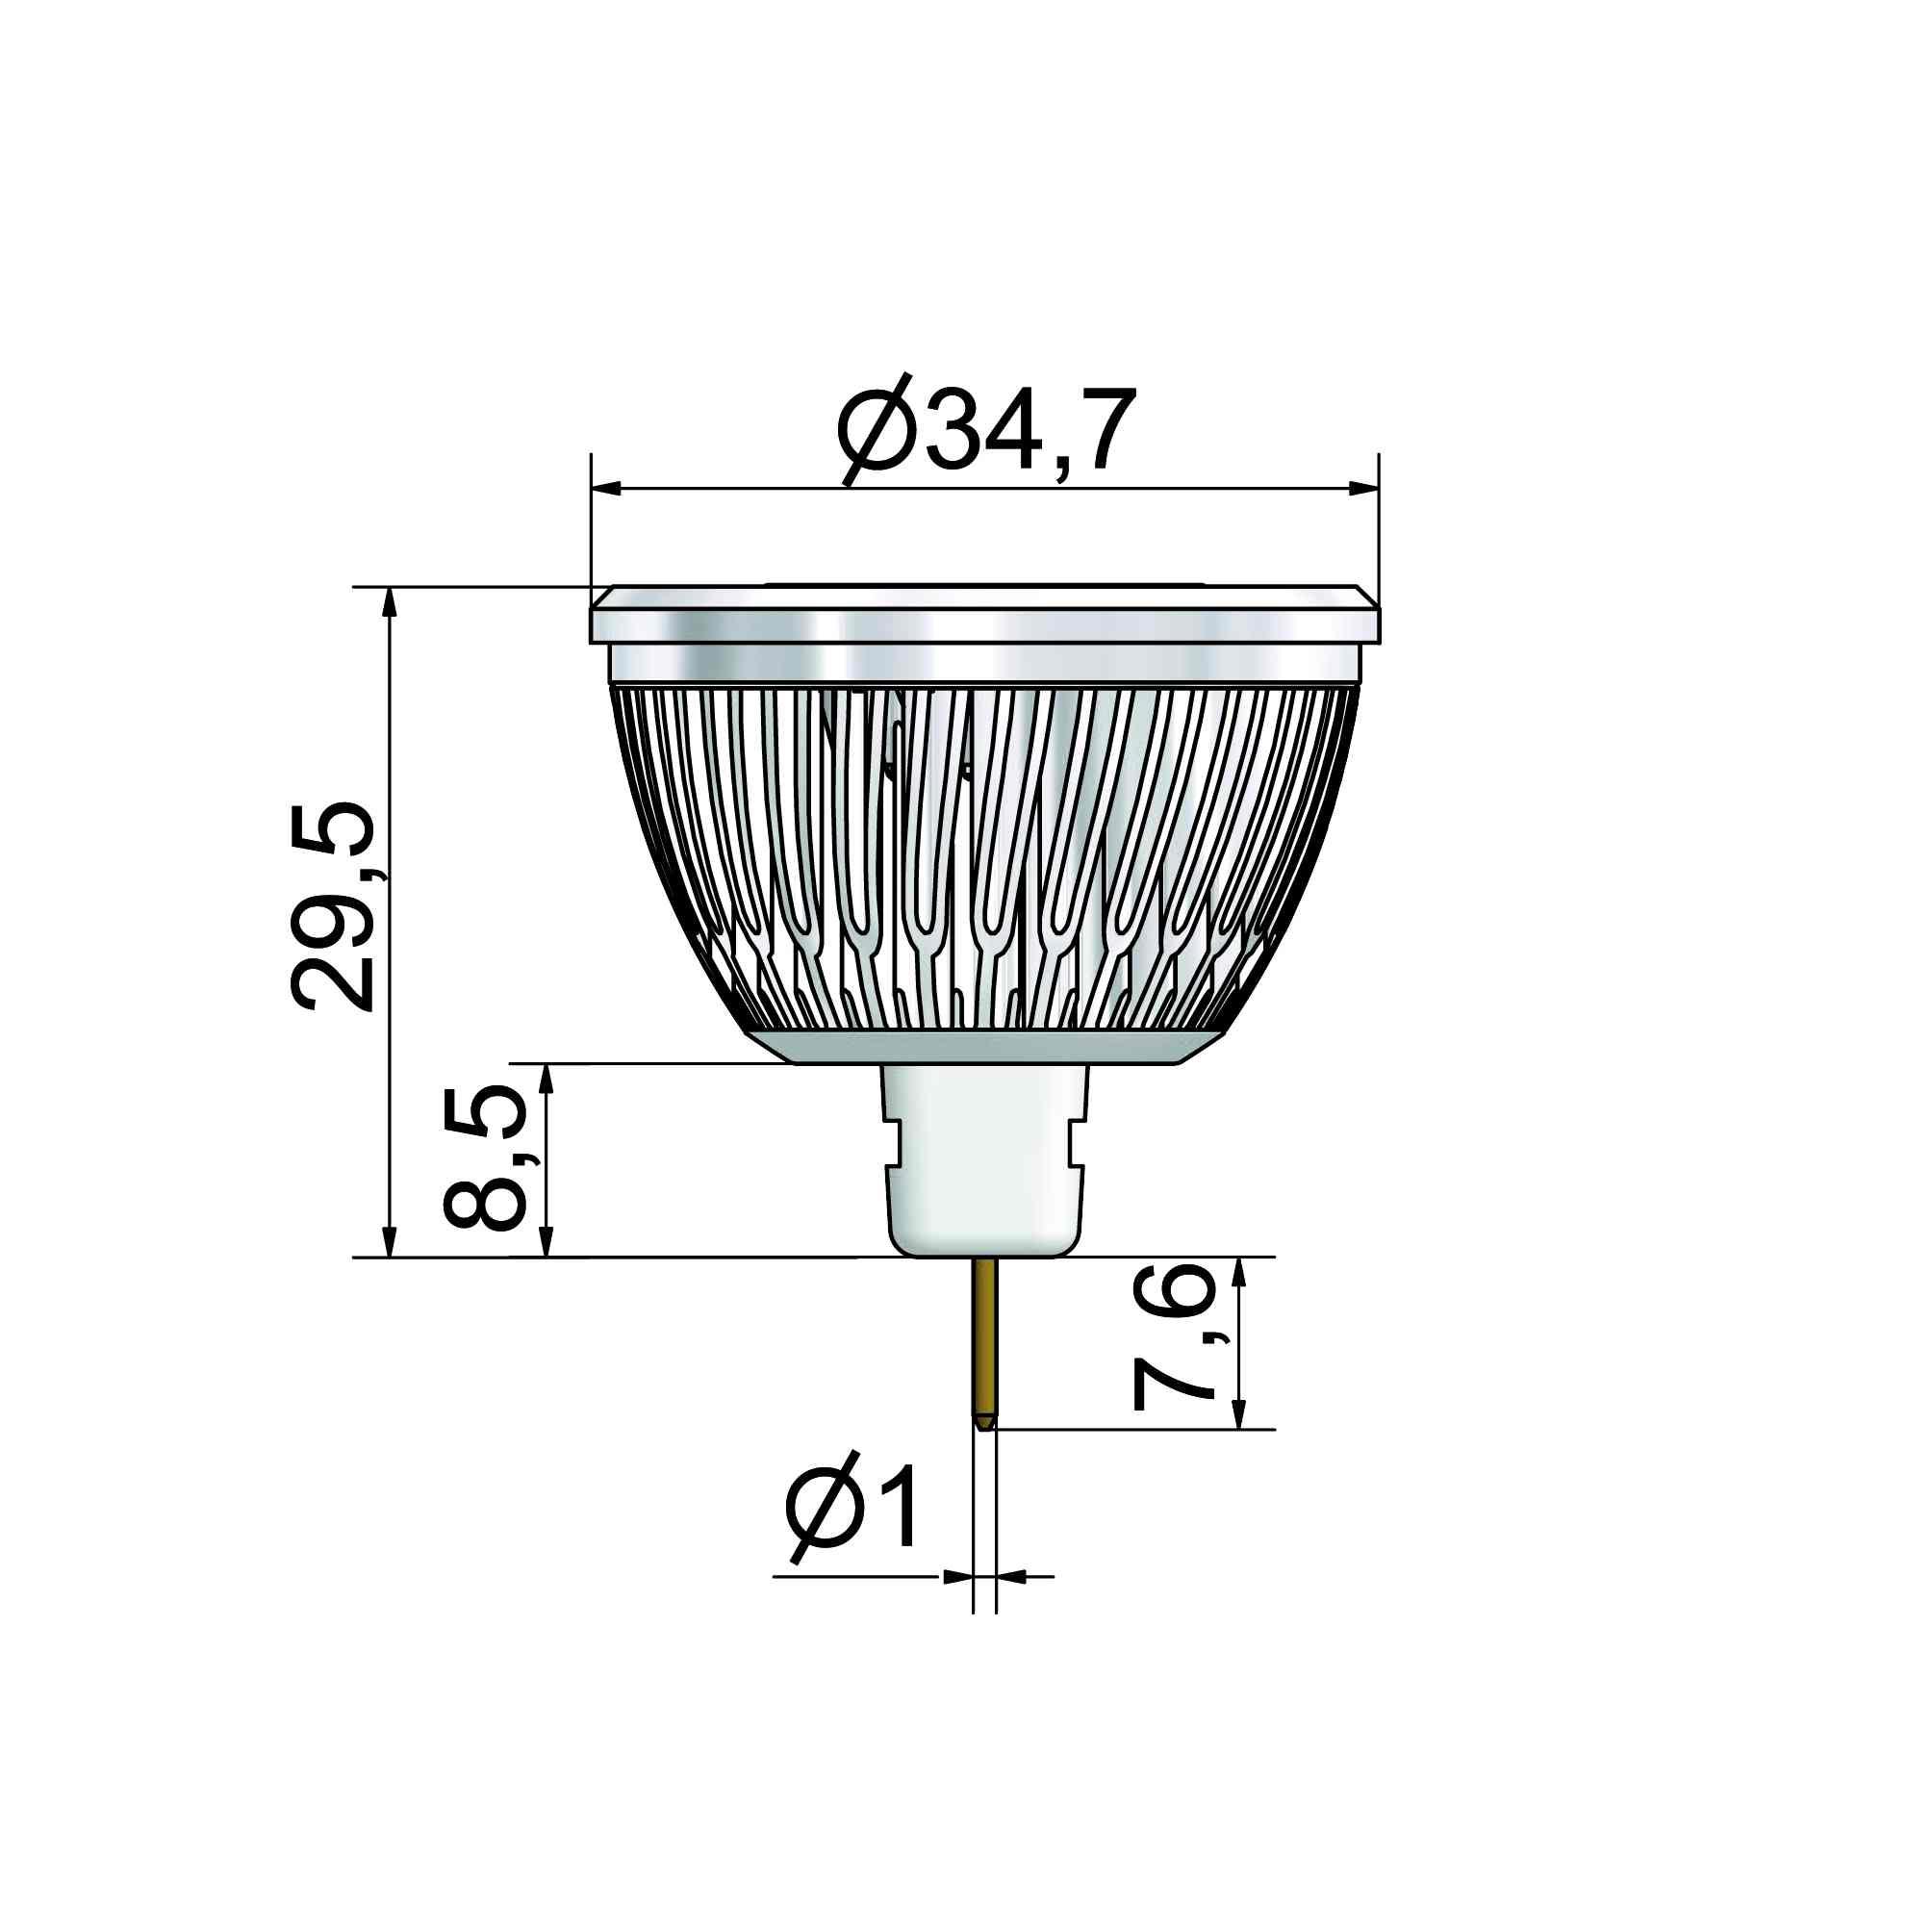 LED-Spot MR11 mit Sockel GU4 - plan